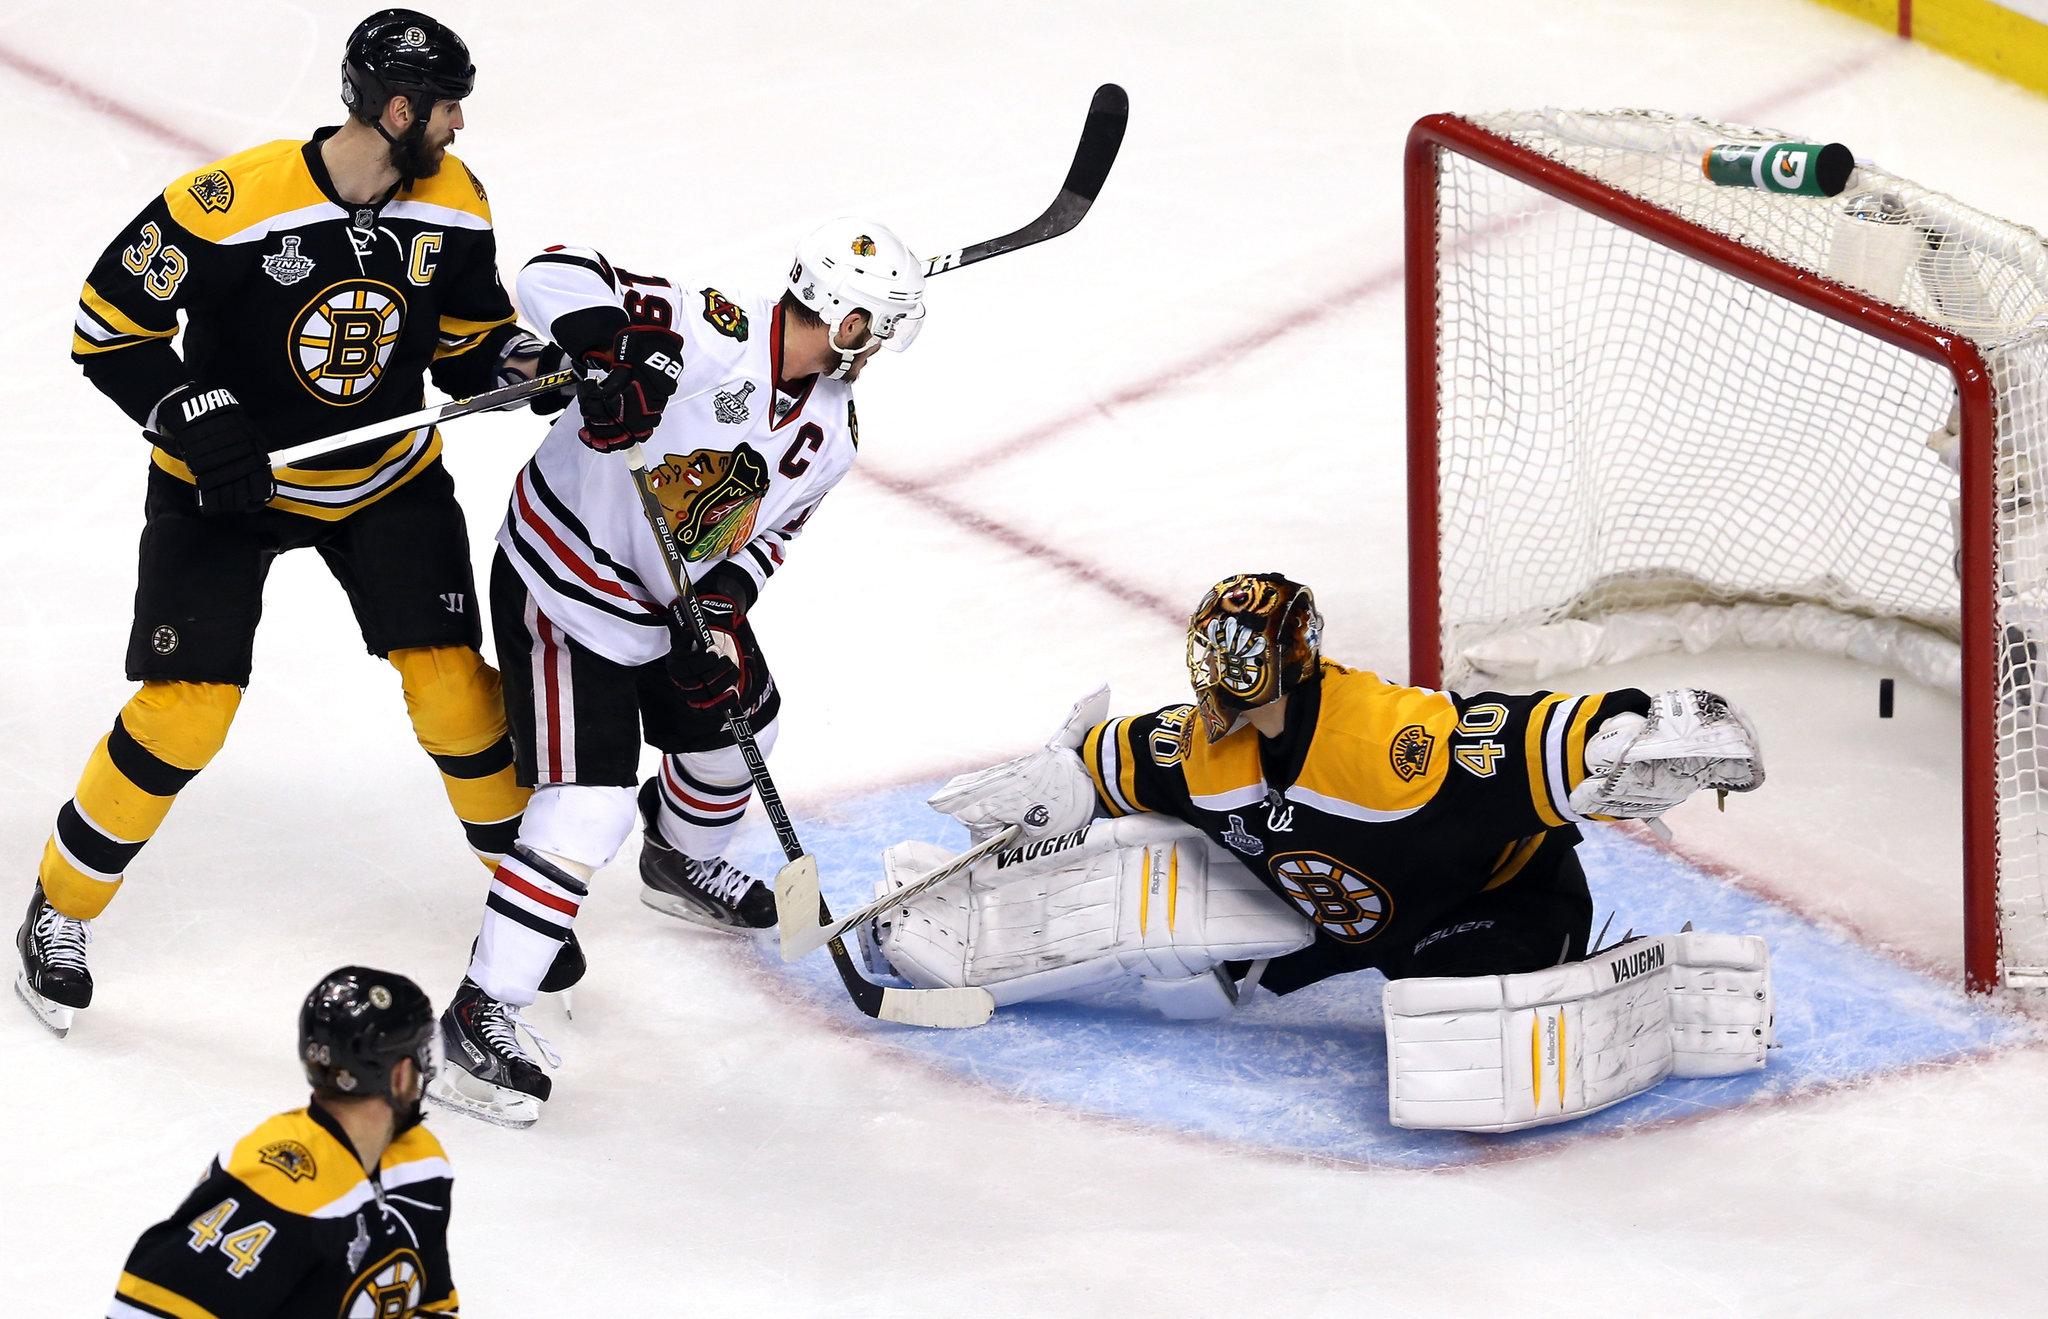 Bilete Pariuri : Madalin propune o tripla din Hochei NHL !